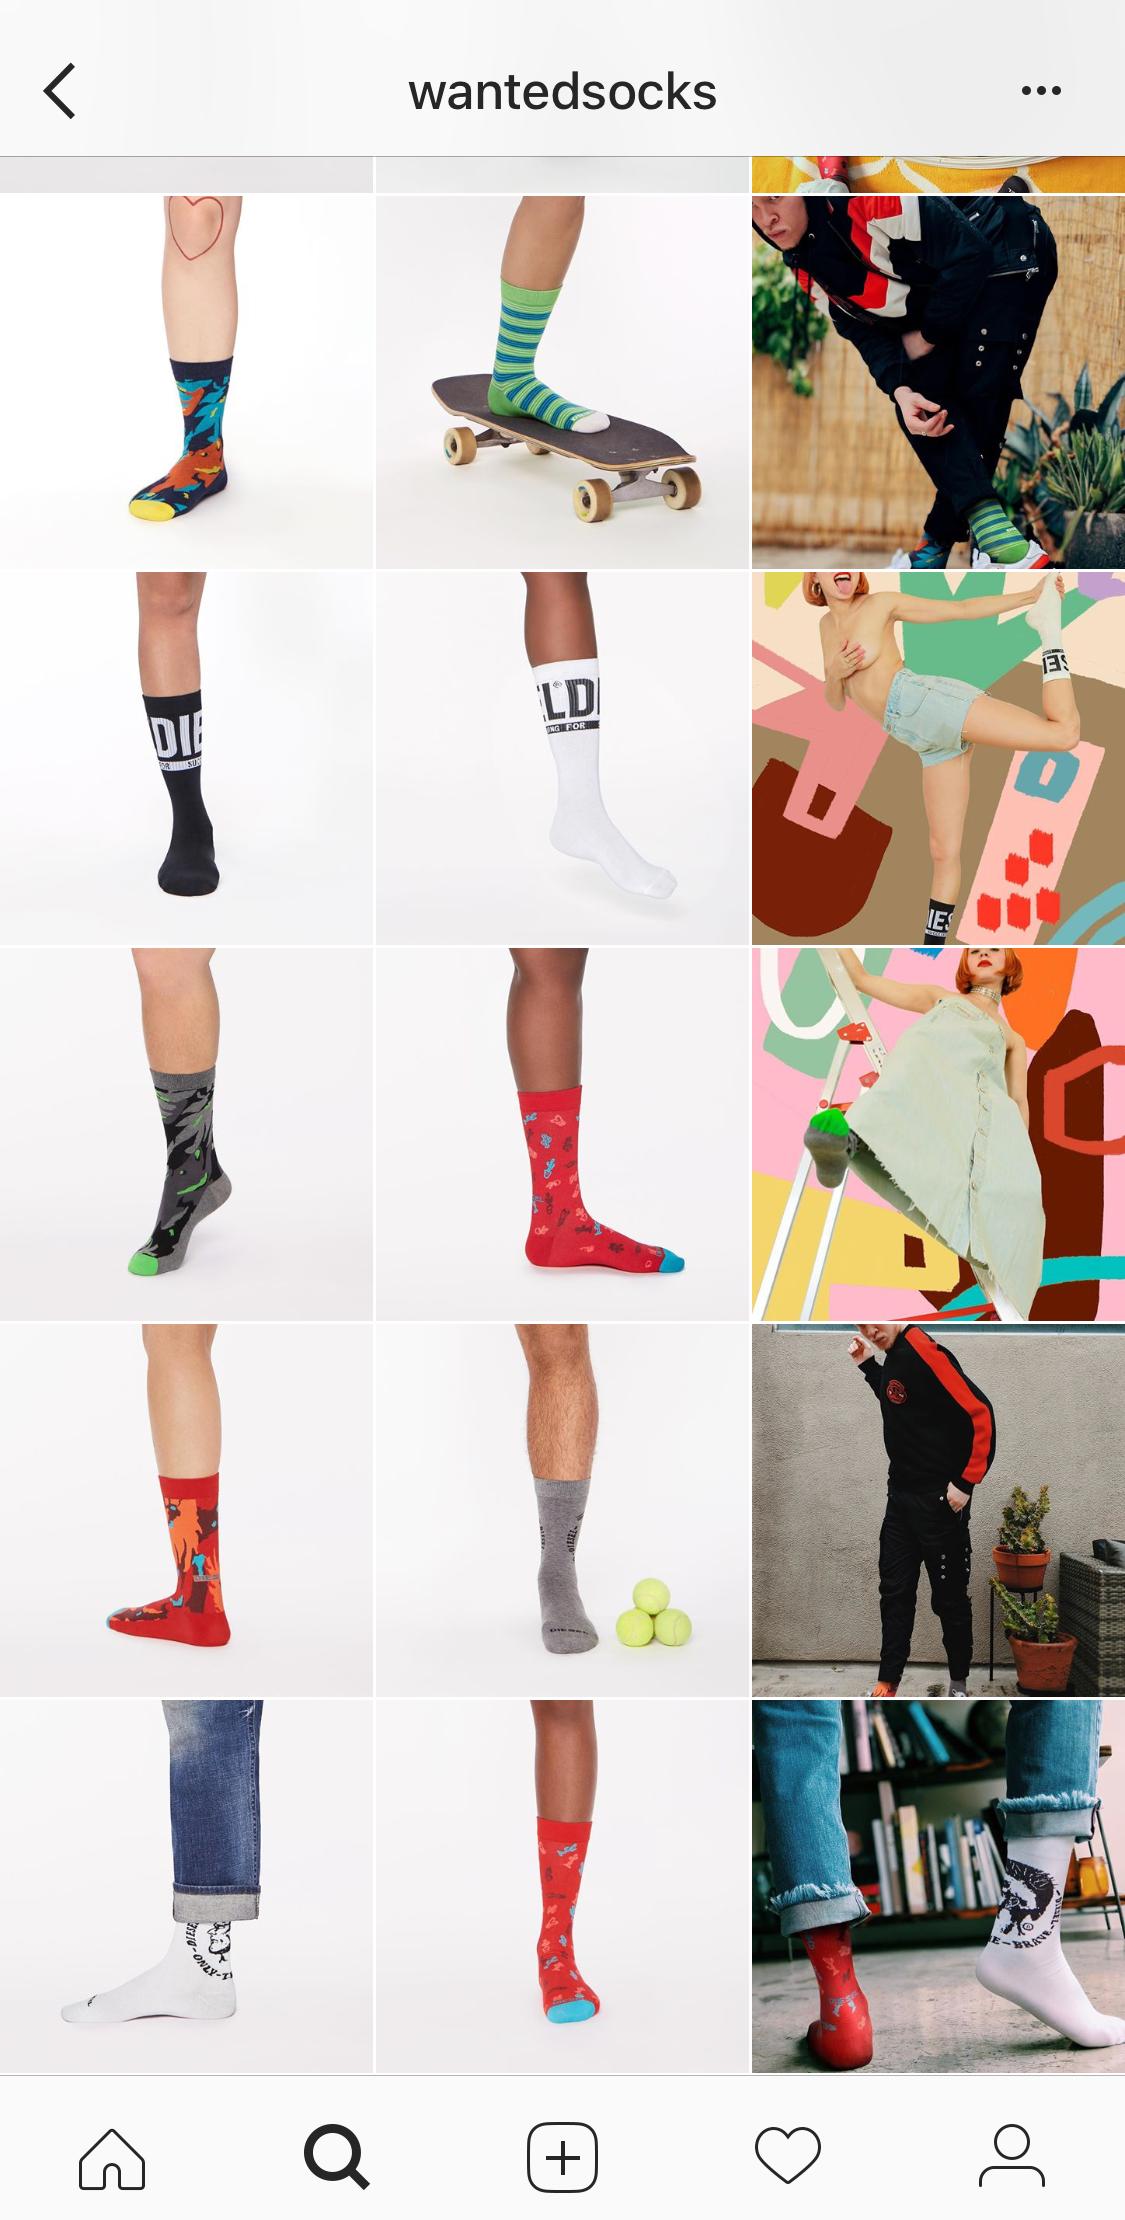 wanted-socks03.PNG